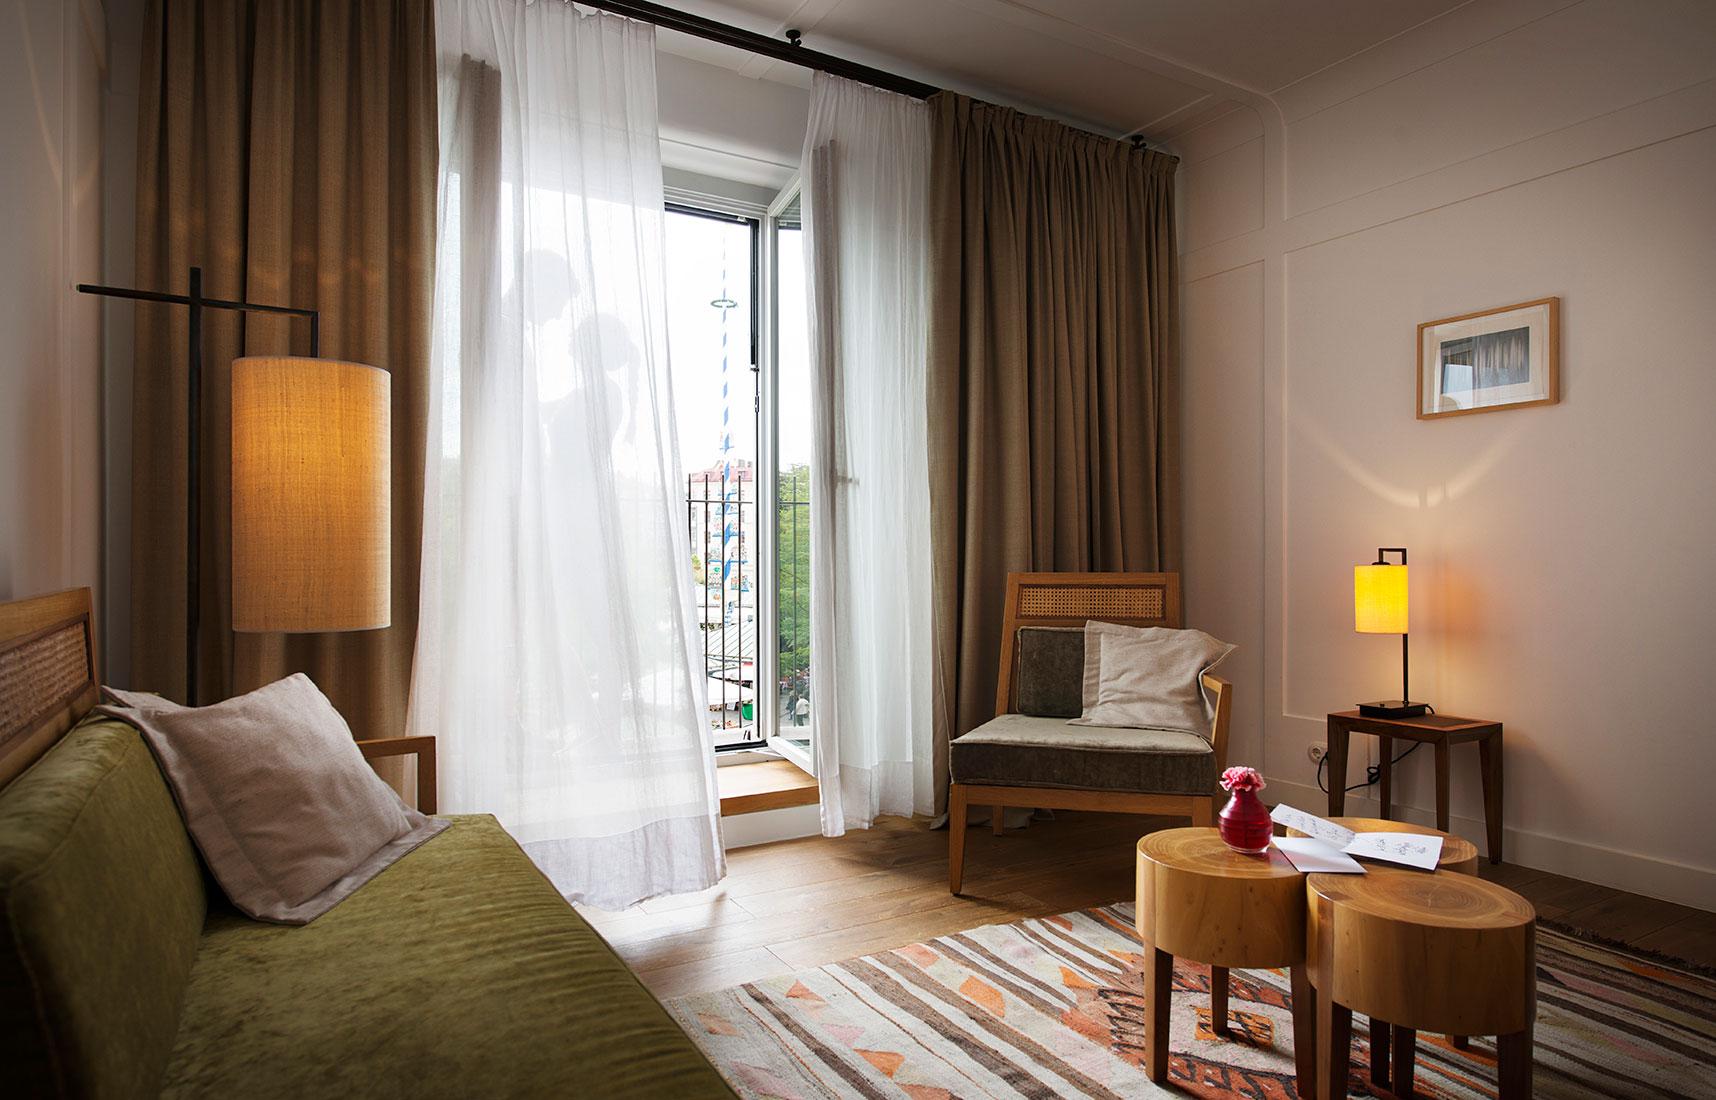 Sorin_Morar_hotels434